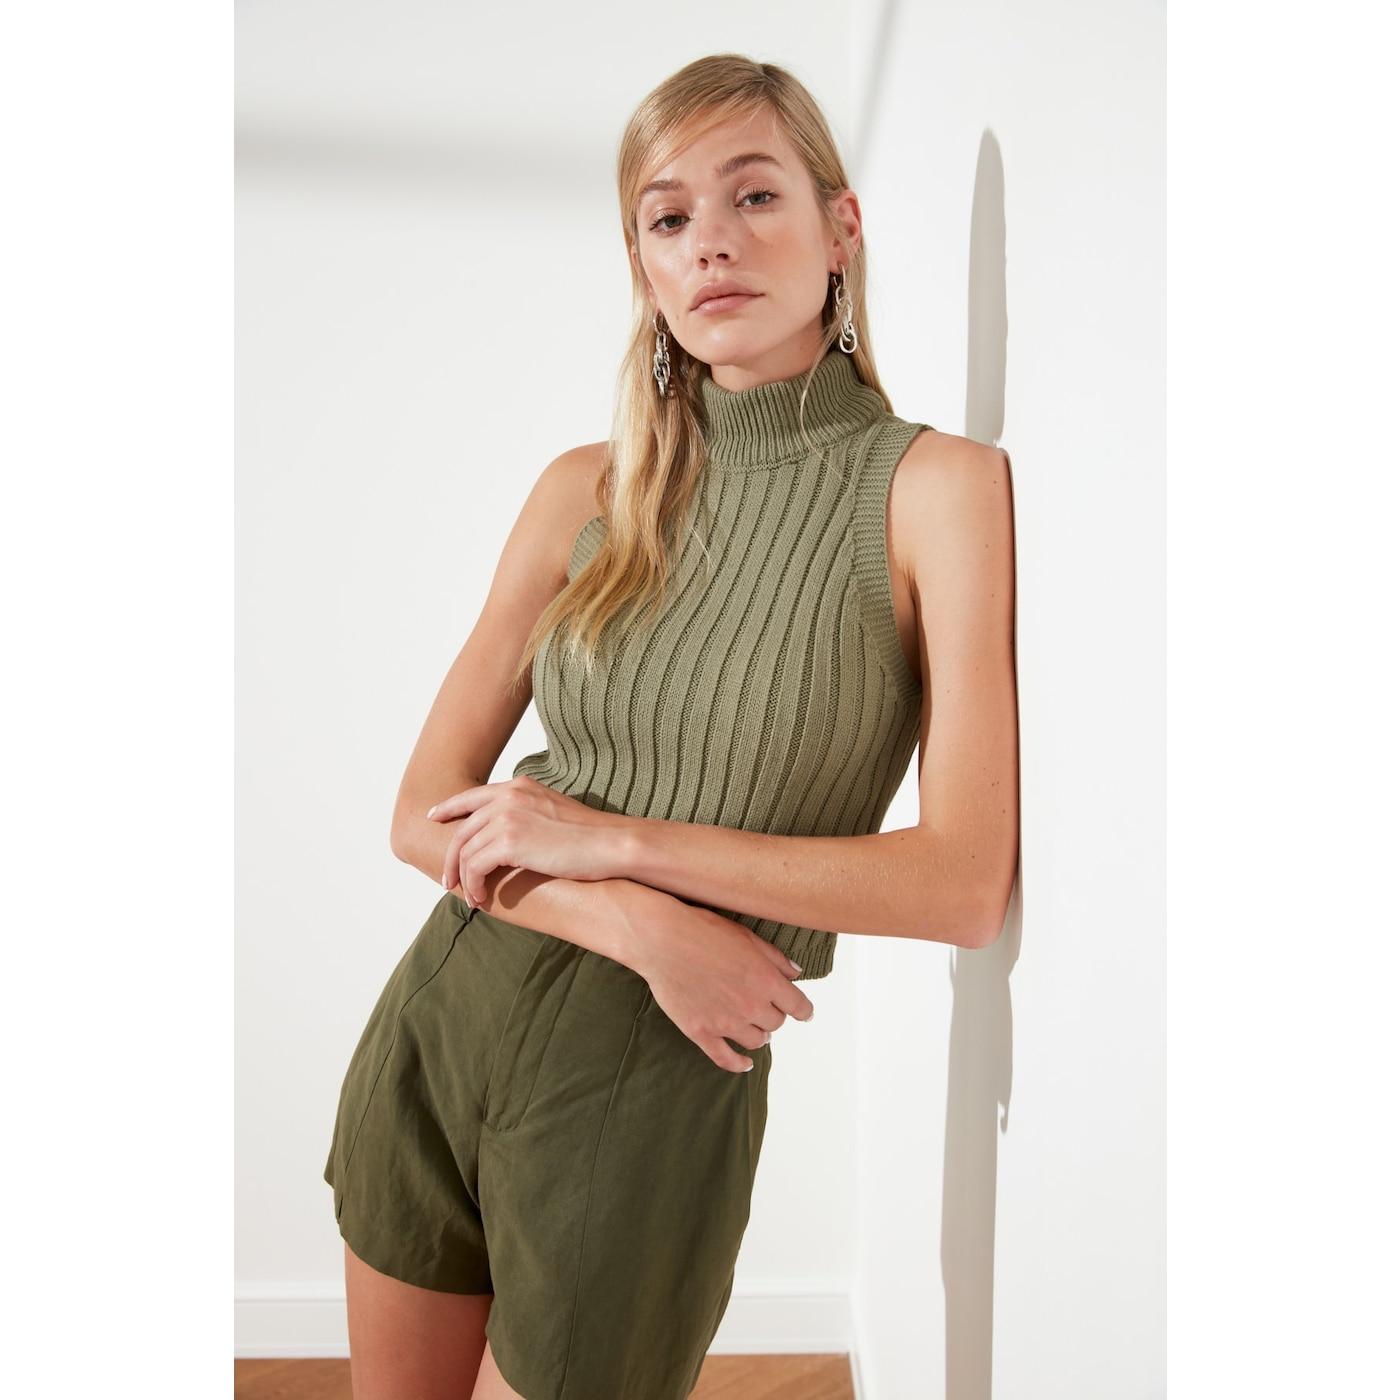 Trendyol Haki Upright Collar Crop Knitwear Blouse dámské Khaki M